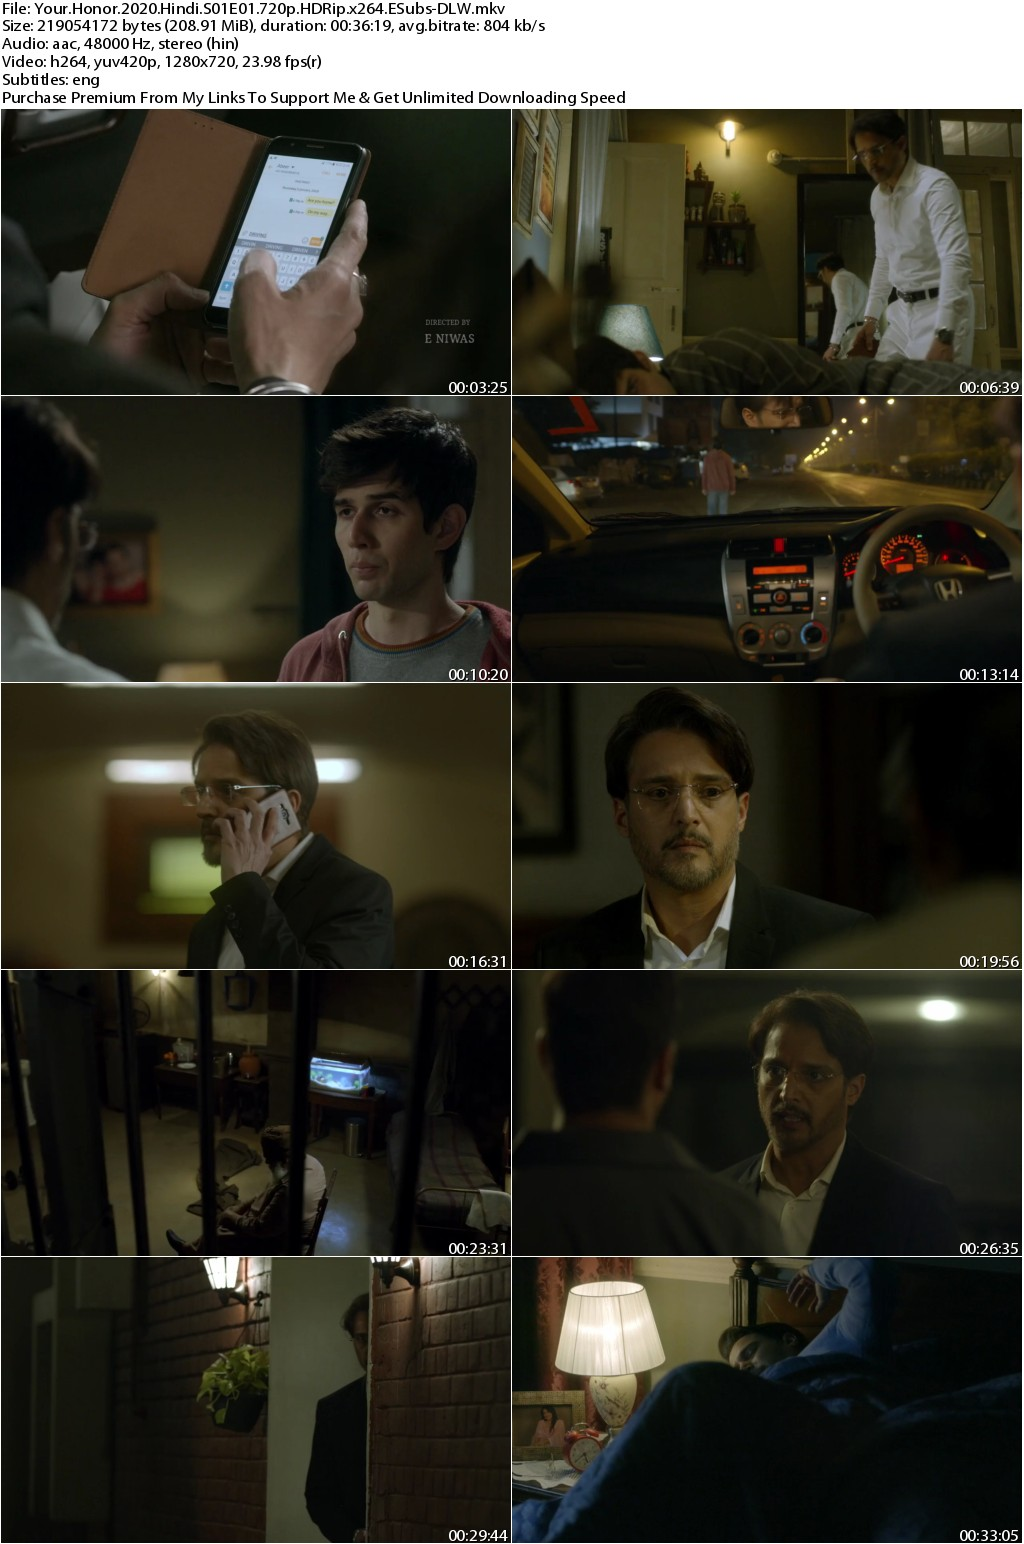 Your Honor 2020 Hindi Season 01 Complete 720p HDRip x264 ESubs 2.5GB-DLW